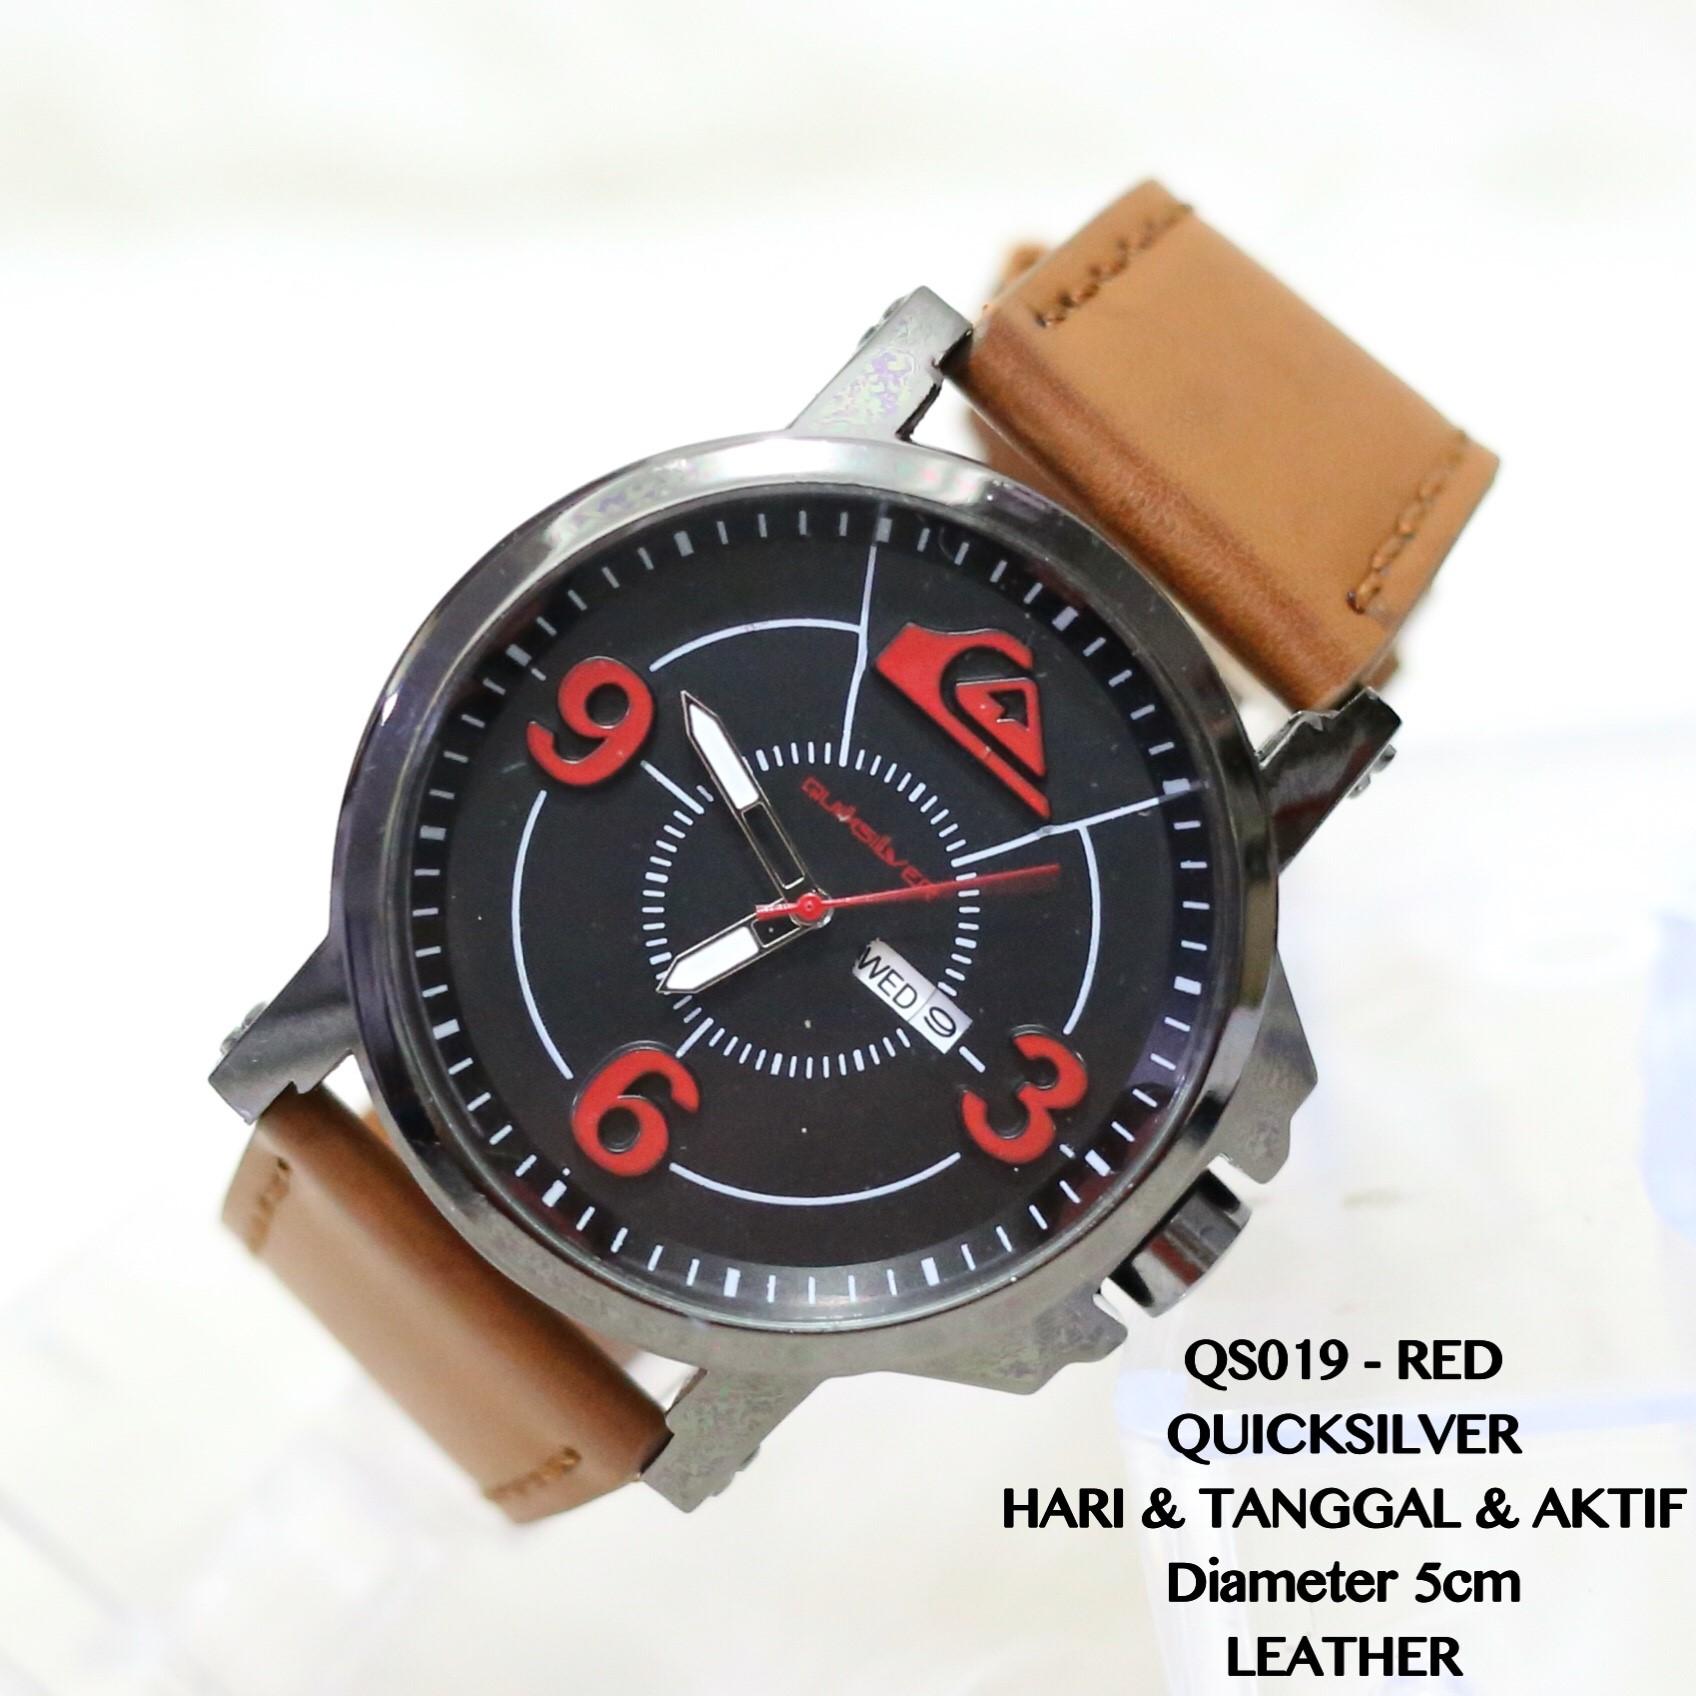 Jam tangan pria quicksilver leather kulit tanggal aktif supplier murah